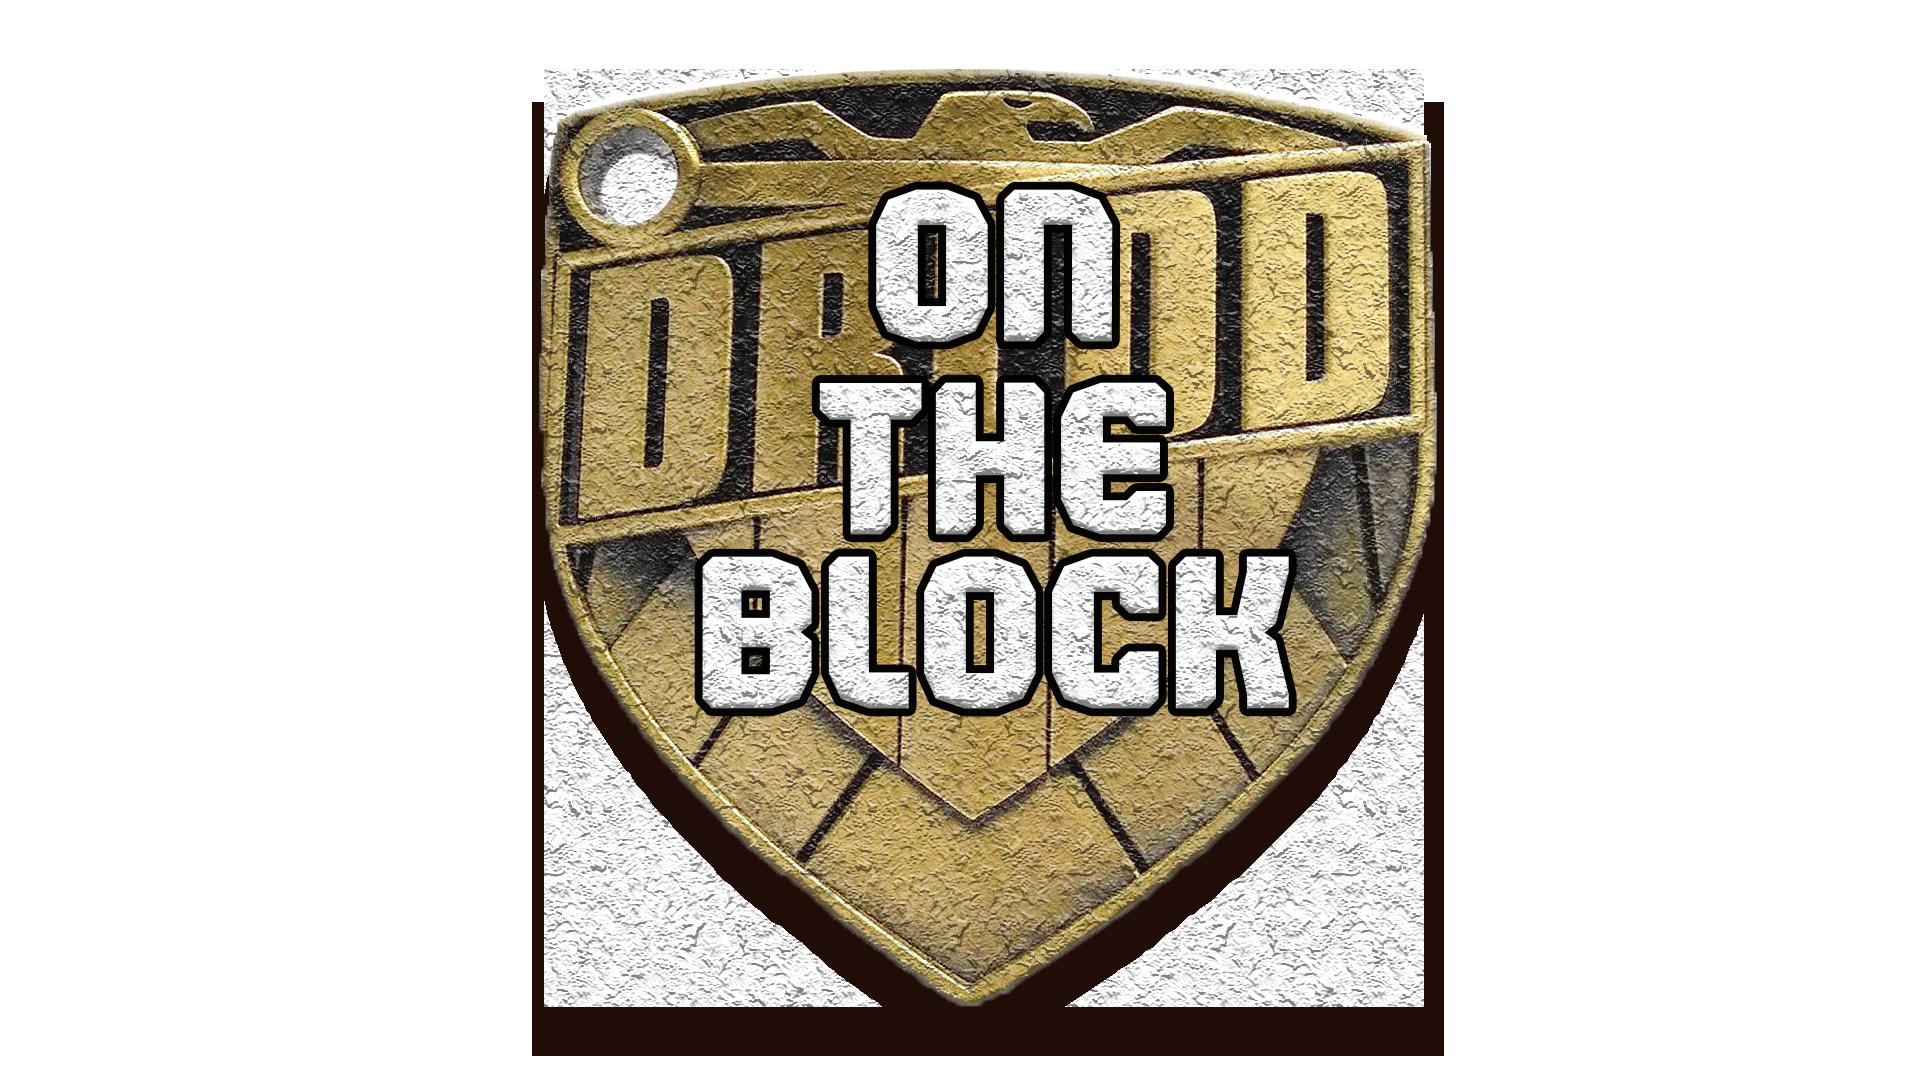 Episode 6 - Judge Dredd: On The Block show art